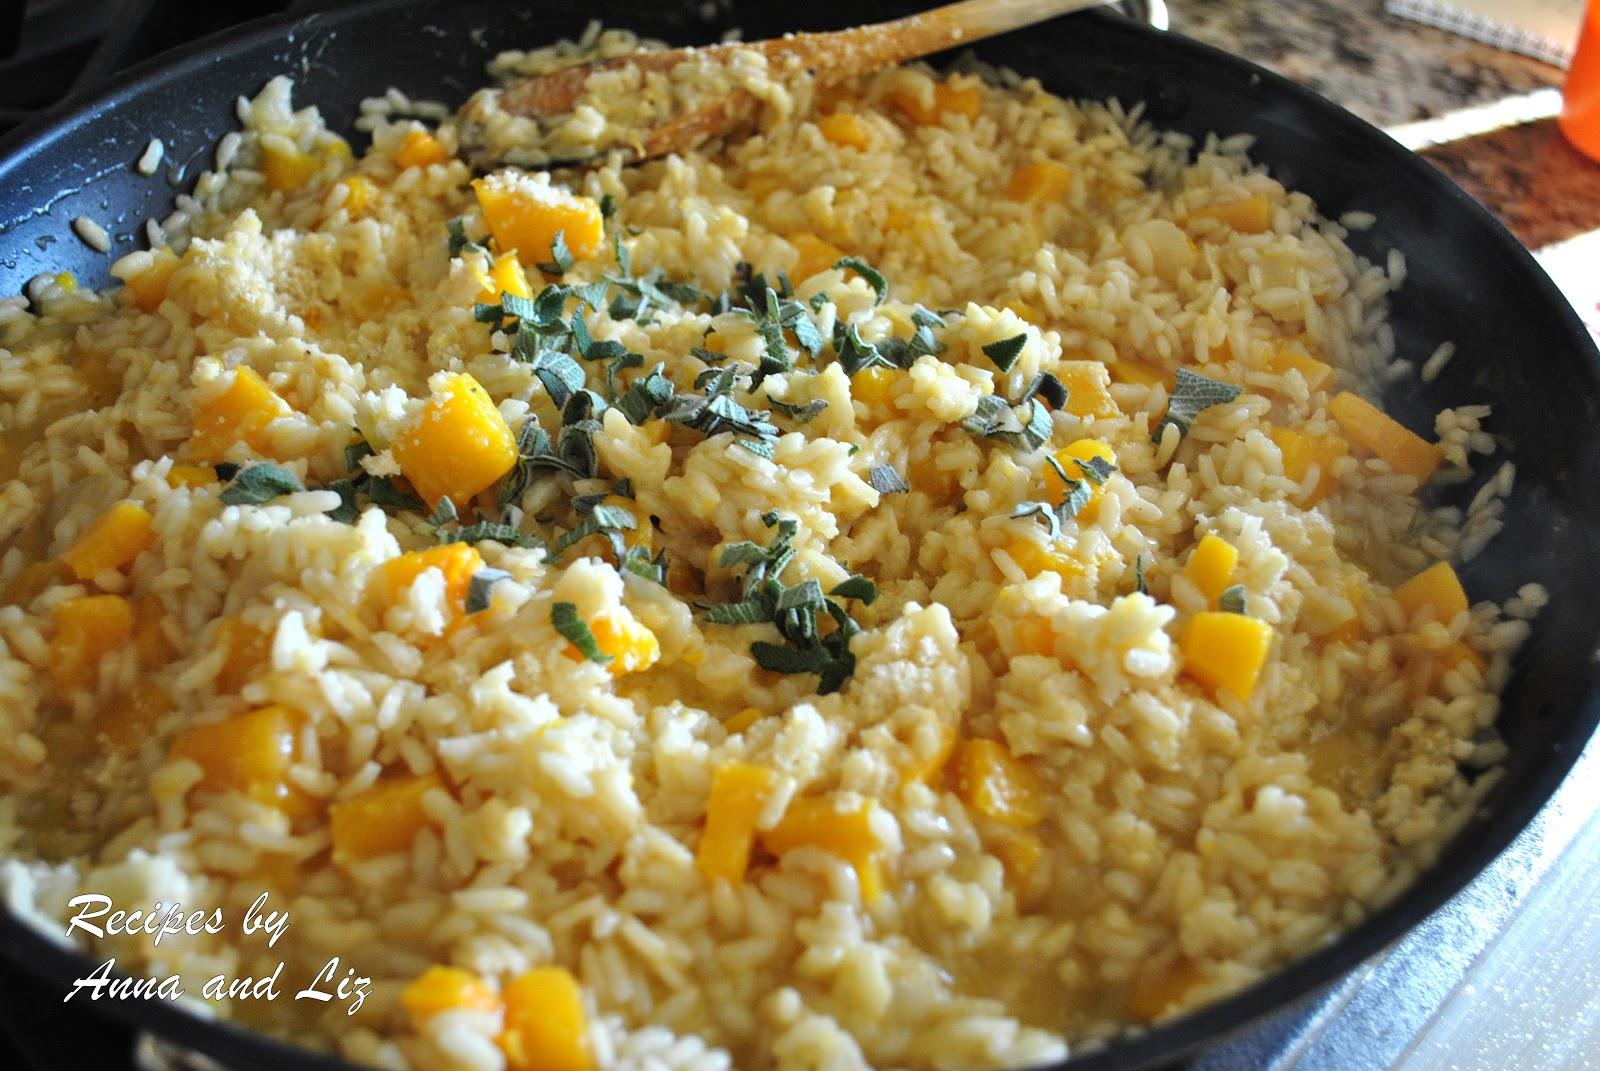 ... : Butternut Squash Risotto with Cheese and Sage (Risotto alla Zucca